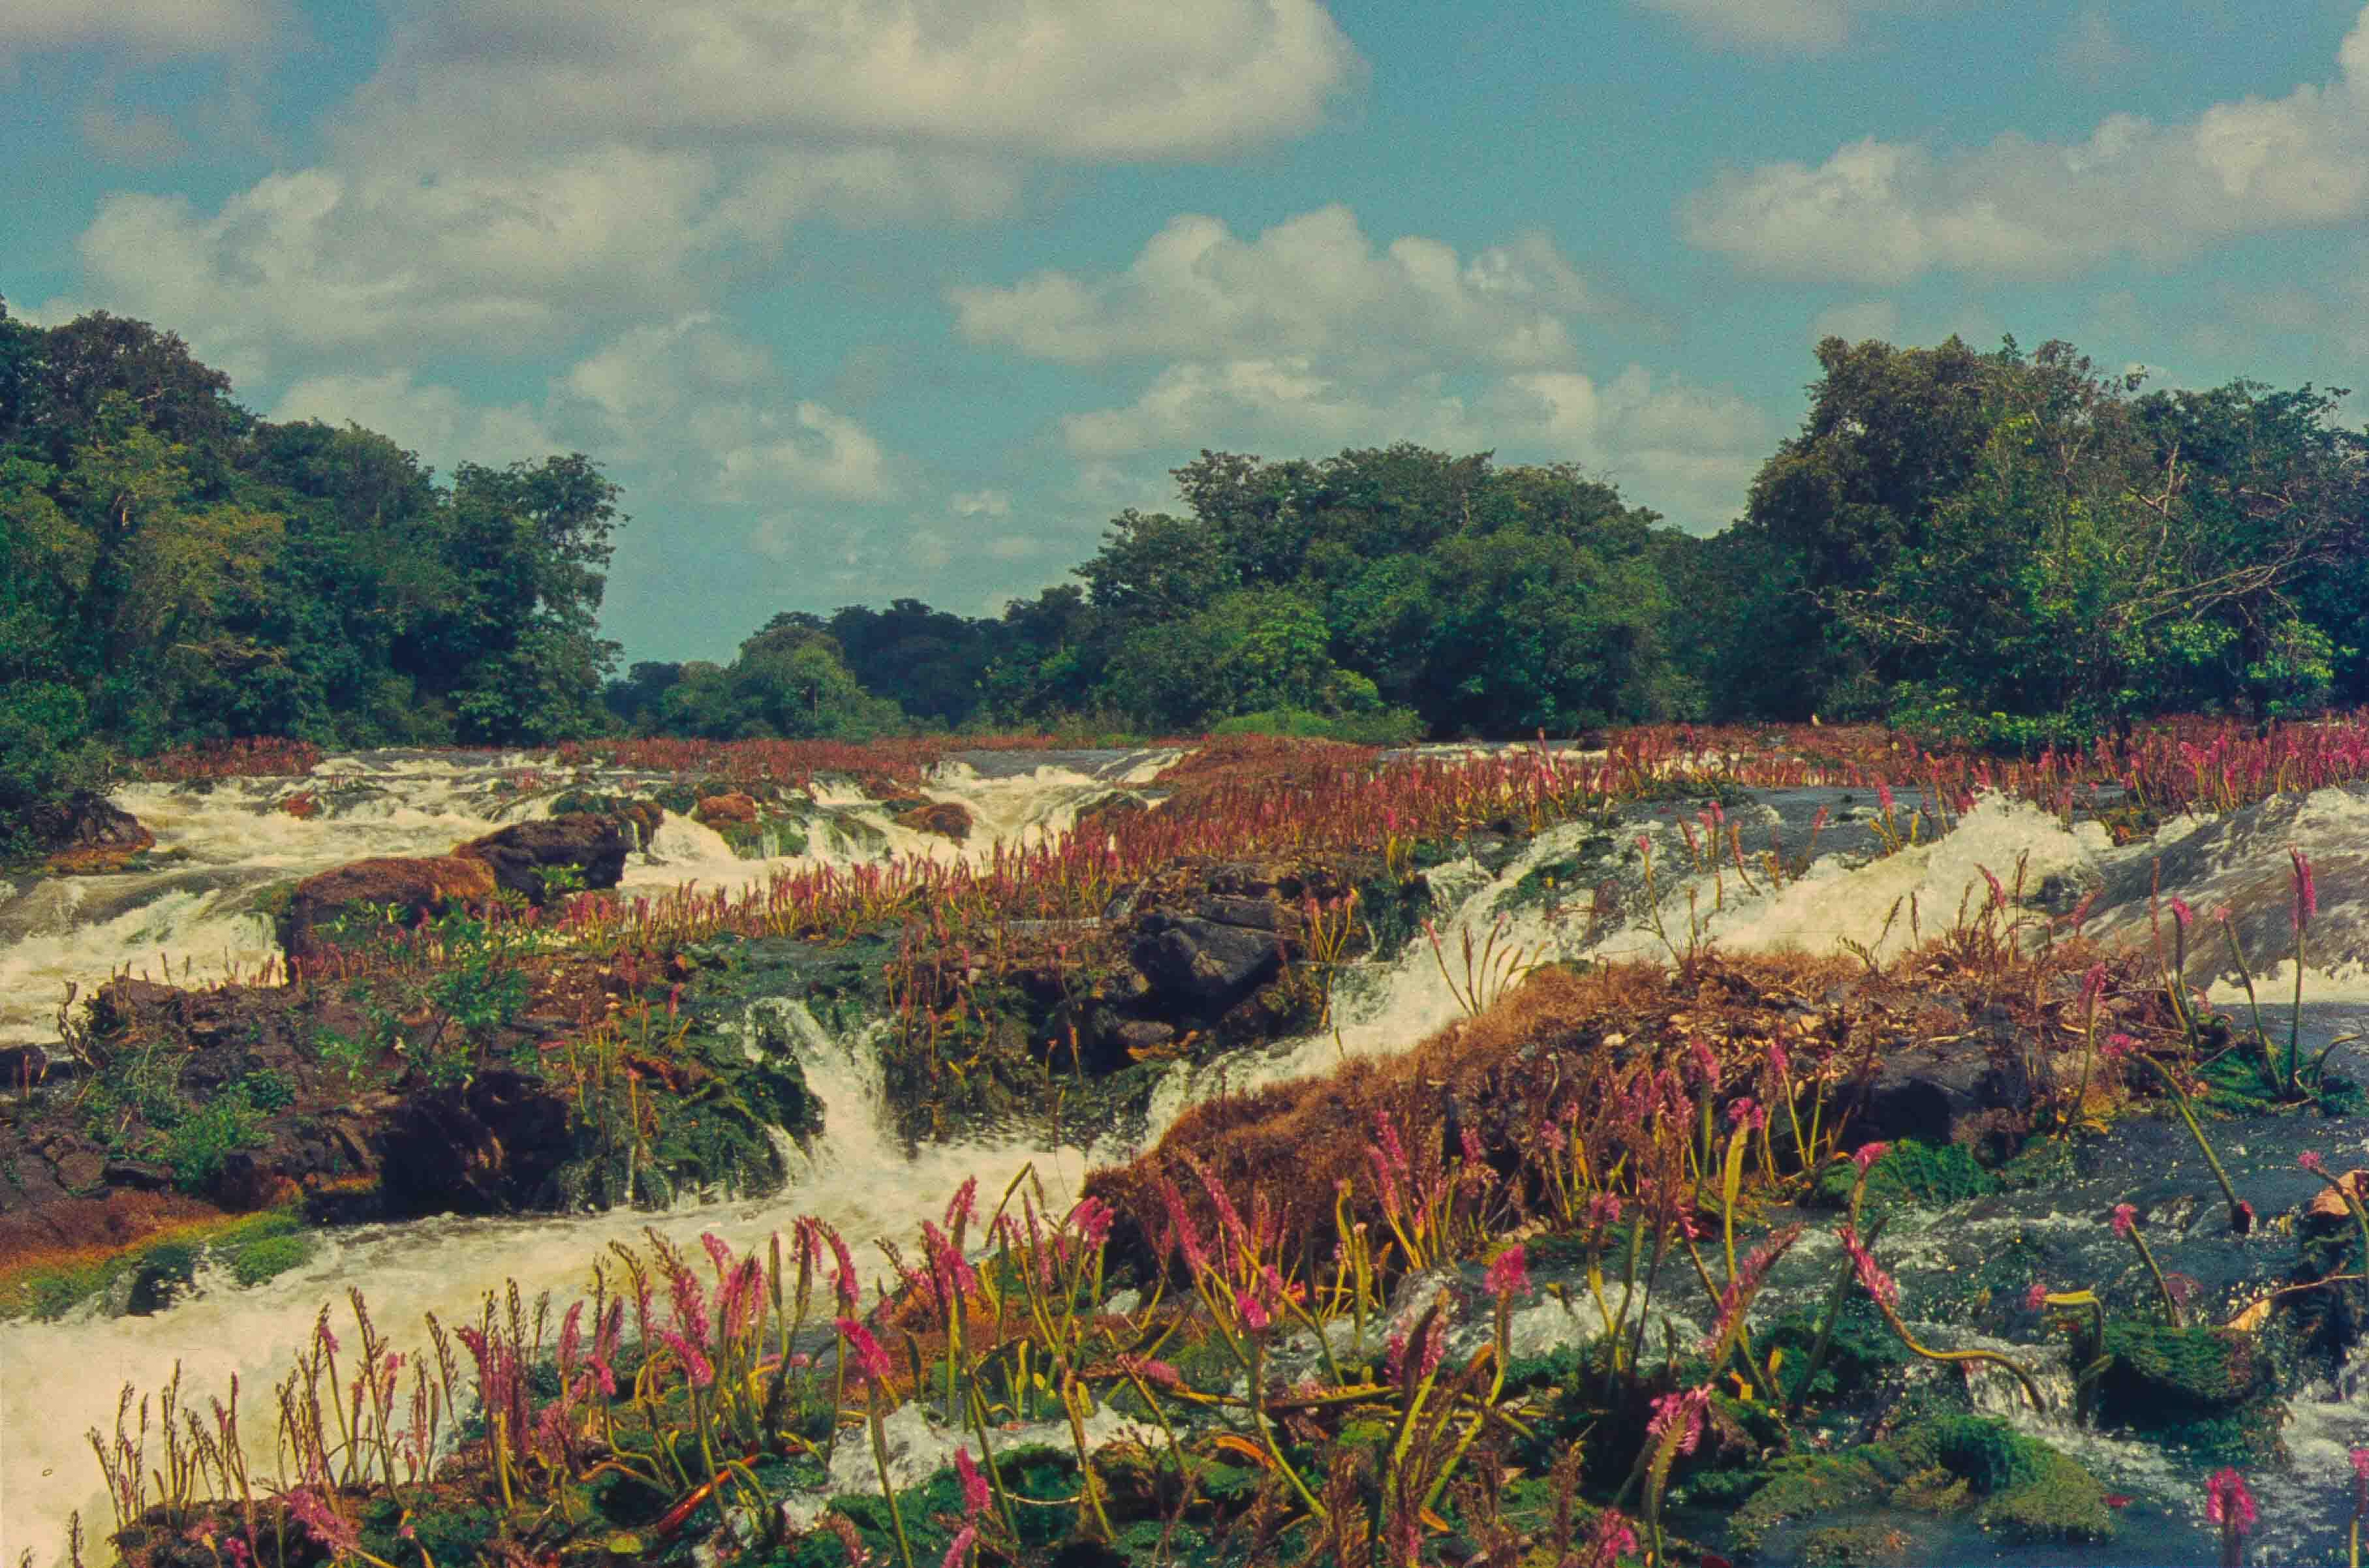 470. Suriname